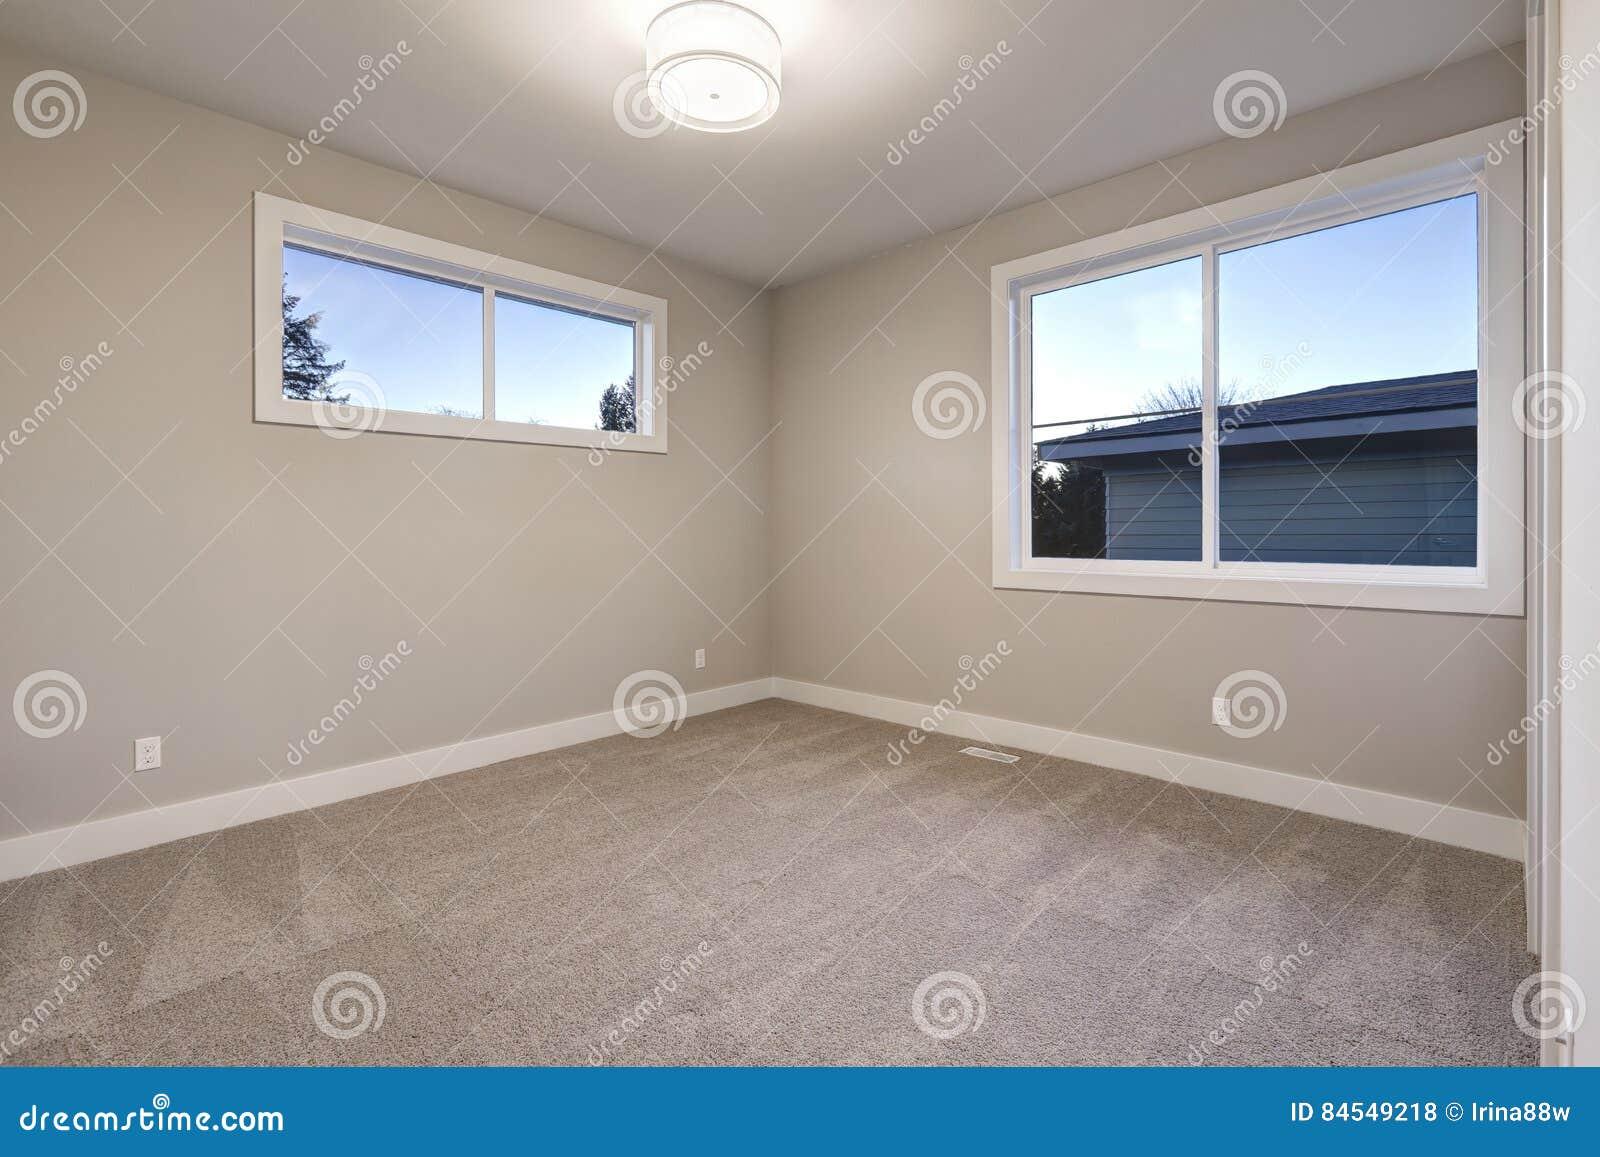 Leerer Rauminnenraum Mit Grauen Wänden Malt Farbe Stockfoto - Bild ...